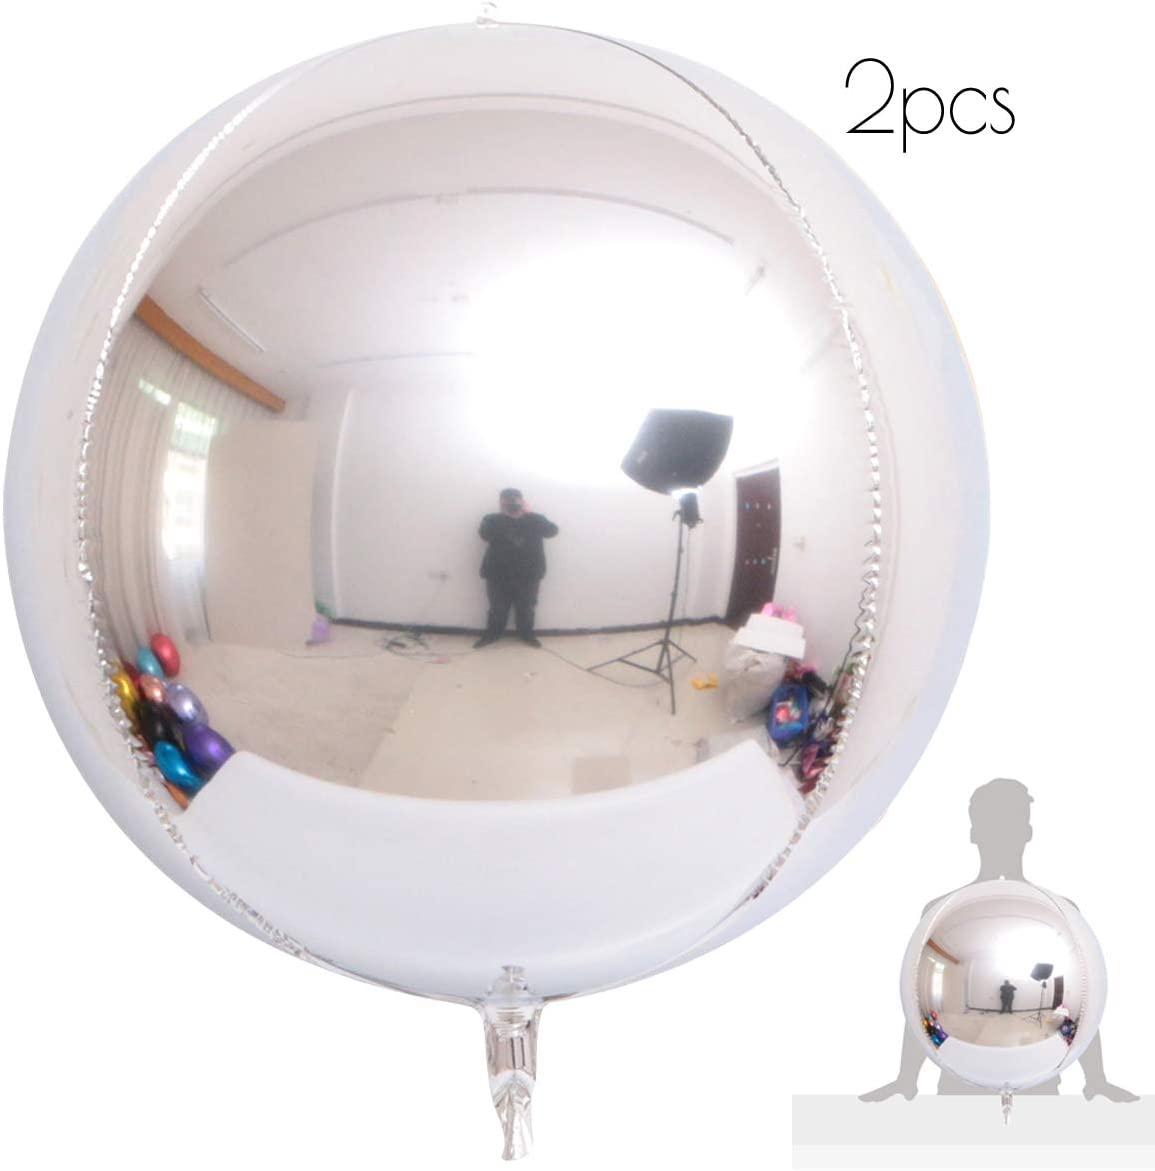 22 Inch Jumbo Ombre ORBZ 4D Sphere Metallic Foil Balloon Birthday Hens Party